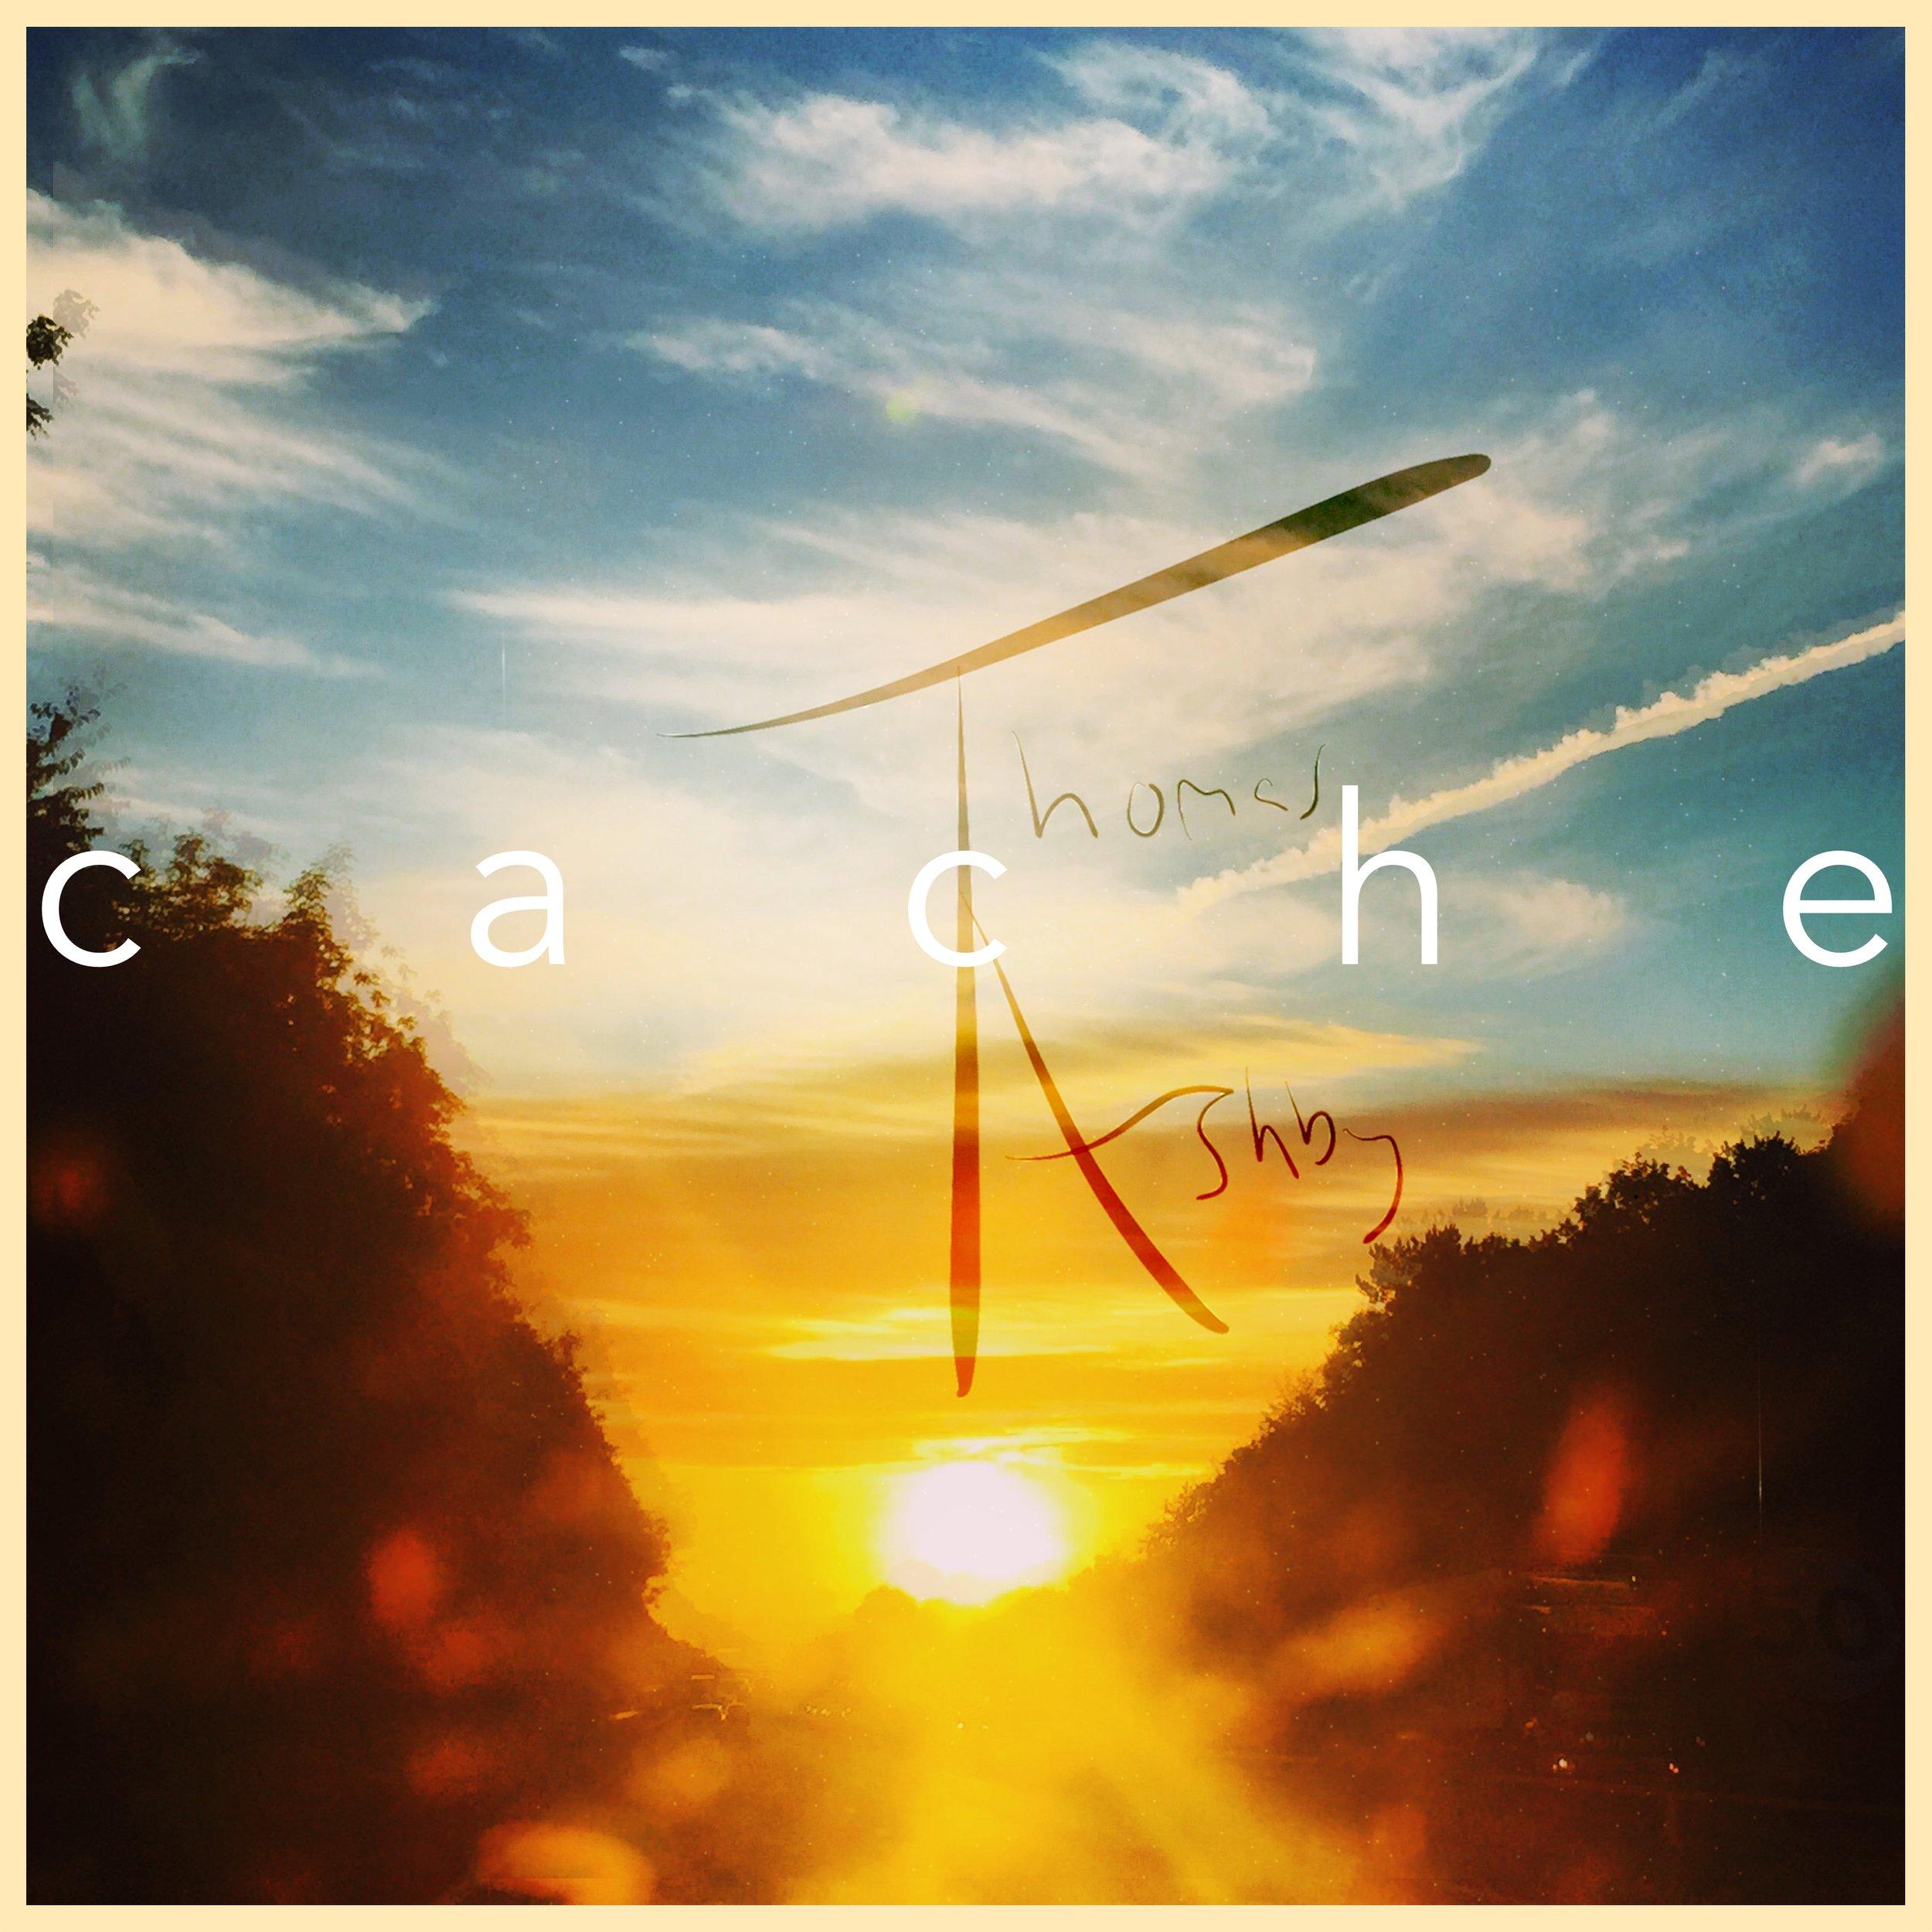 Debut AlbumCache - Released 09 September, 2016.Genre: Jazzy Folk & Blues.The single